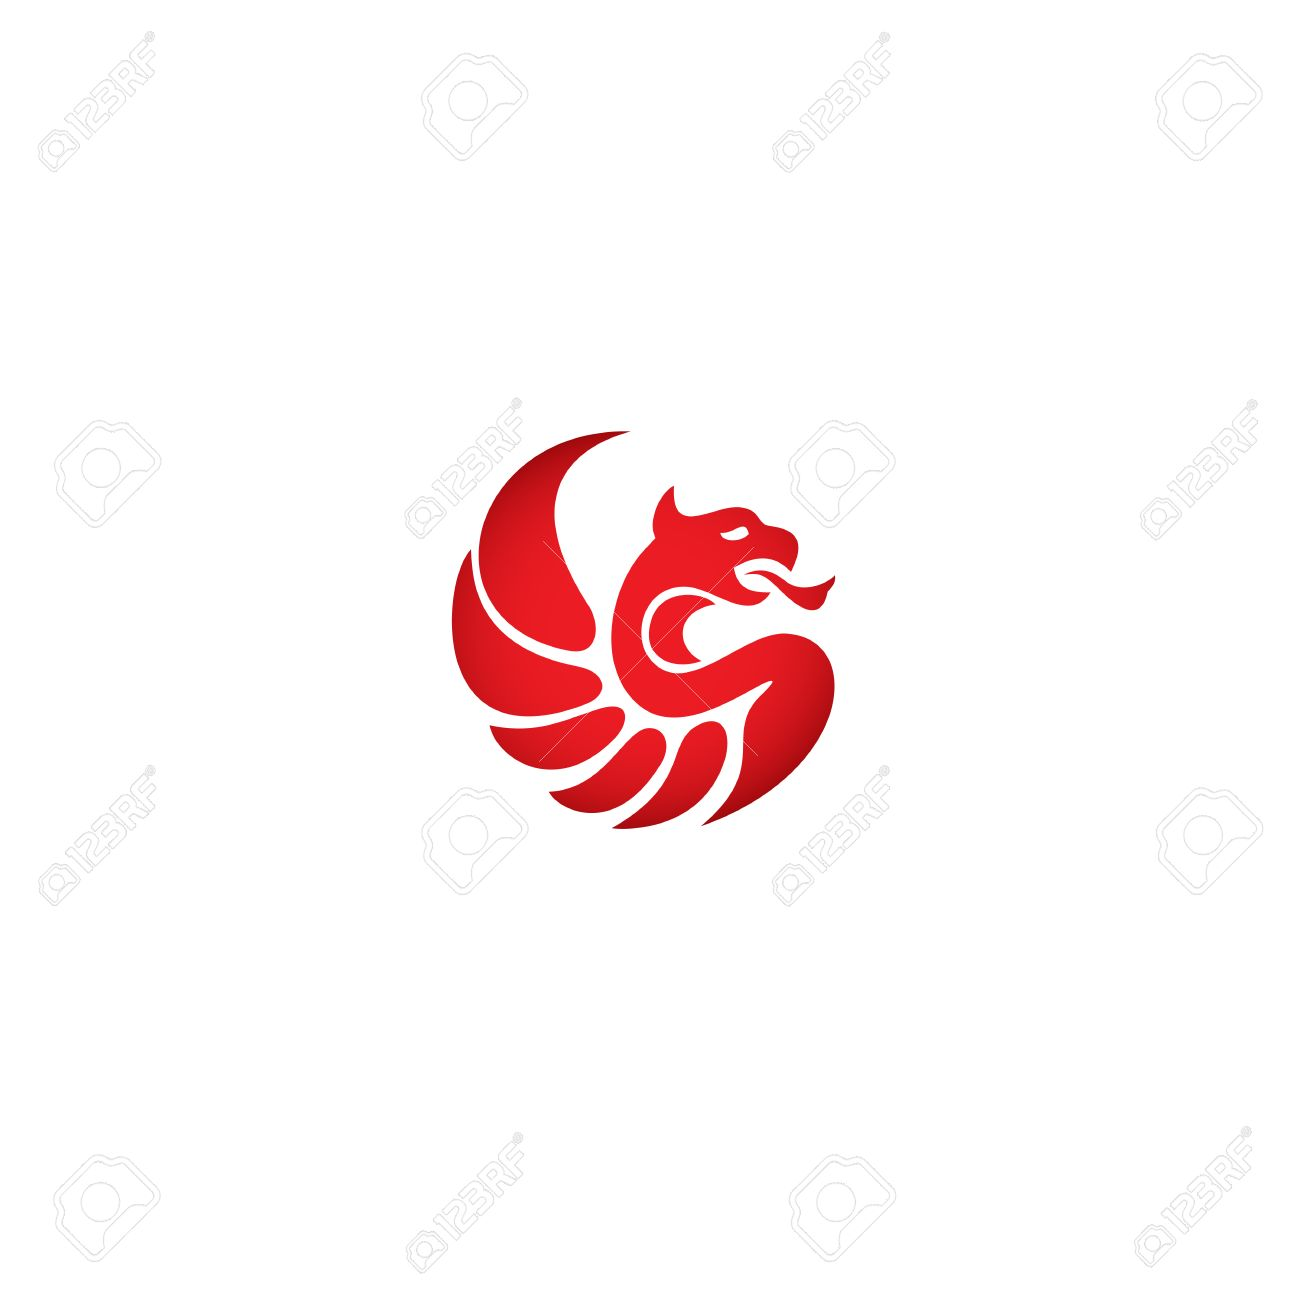 Logotipo Del Estilo De La Silueta, Plantilla Icono. Diseño De ...